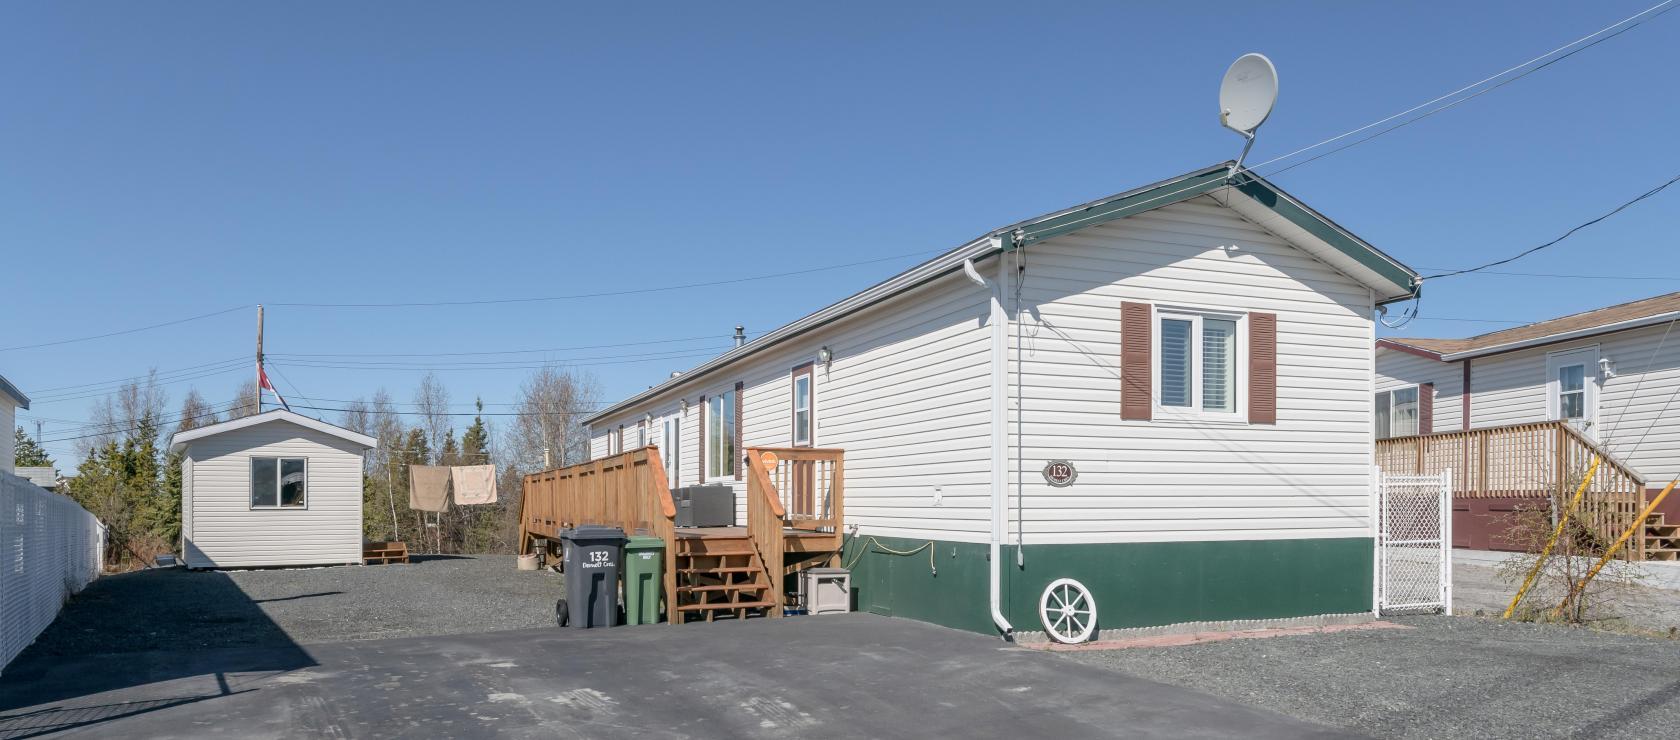 132 Demelt Crescent, Frame Lake South, Yellowknife 2